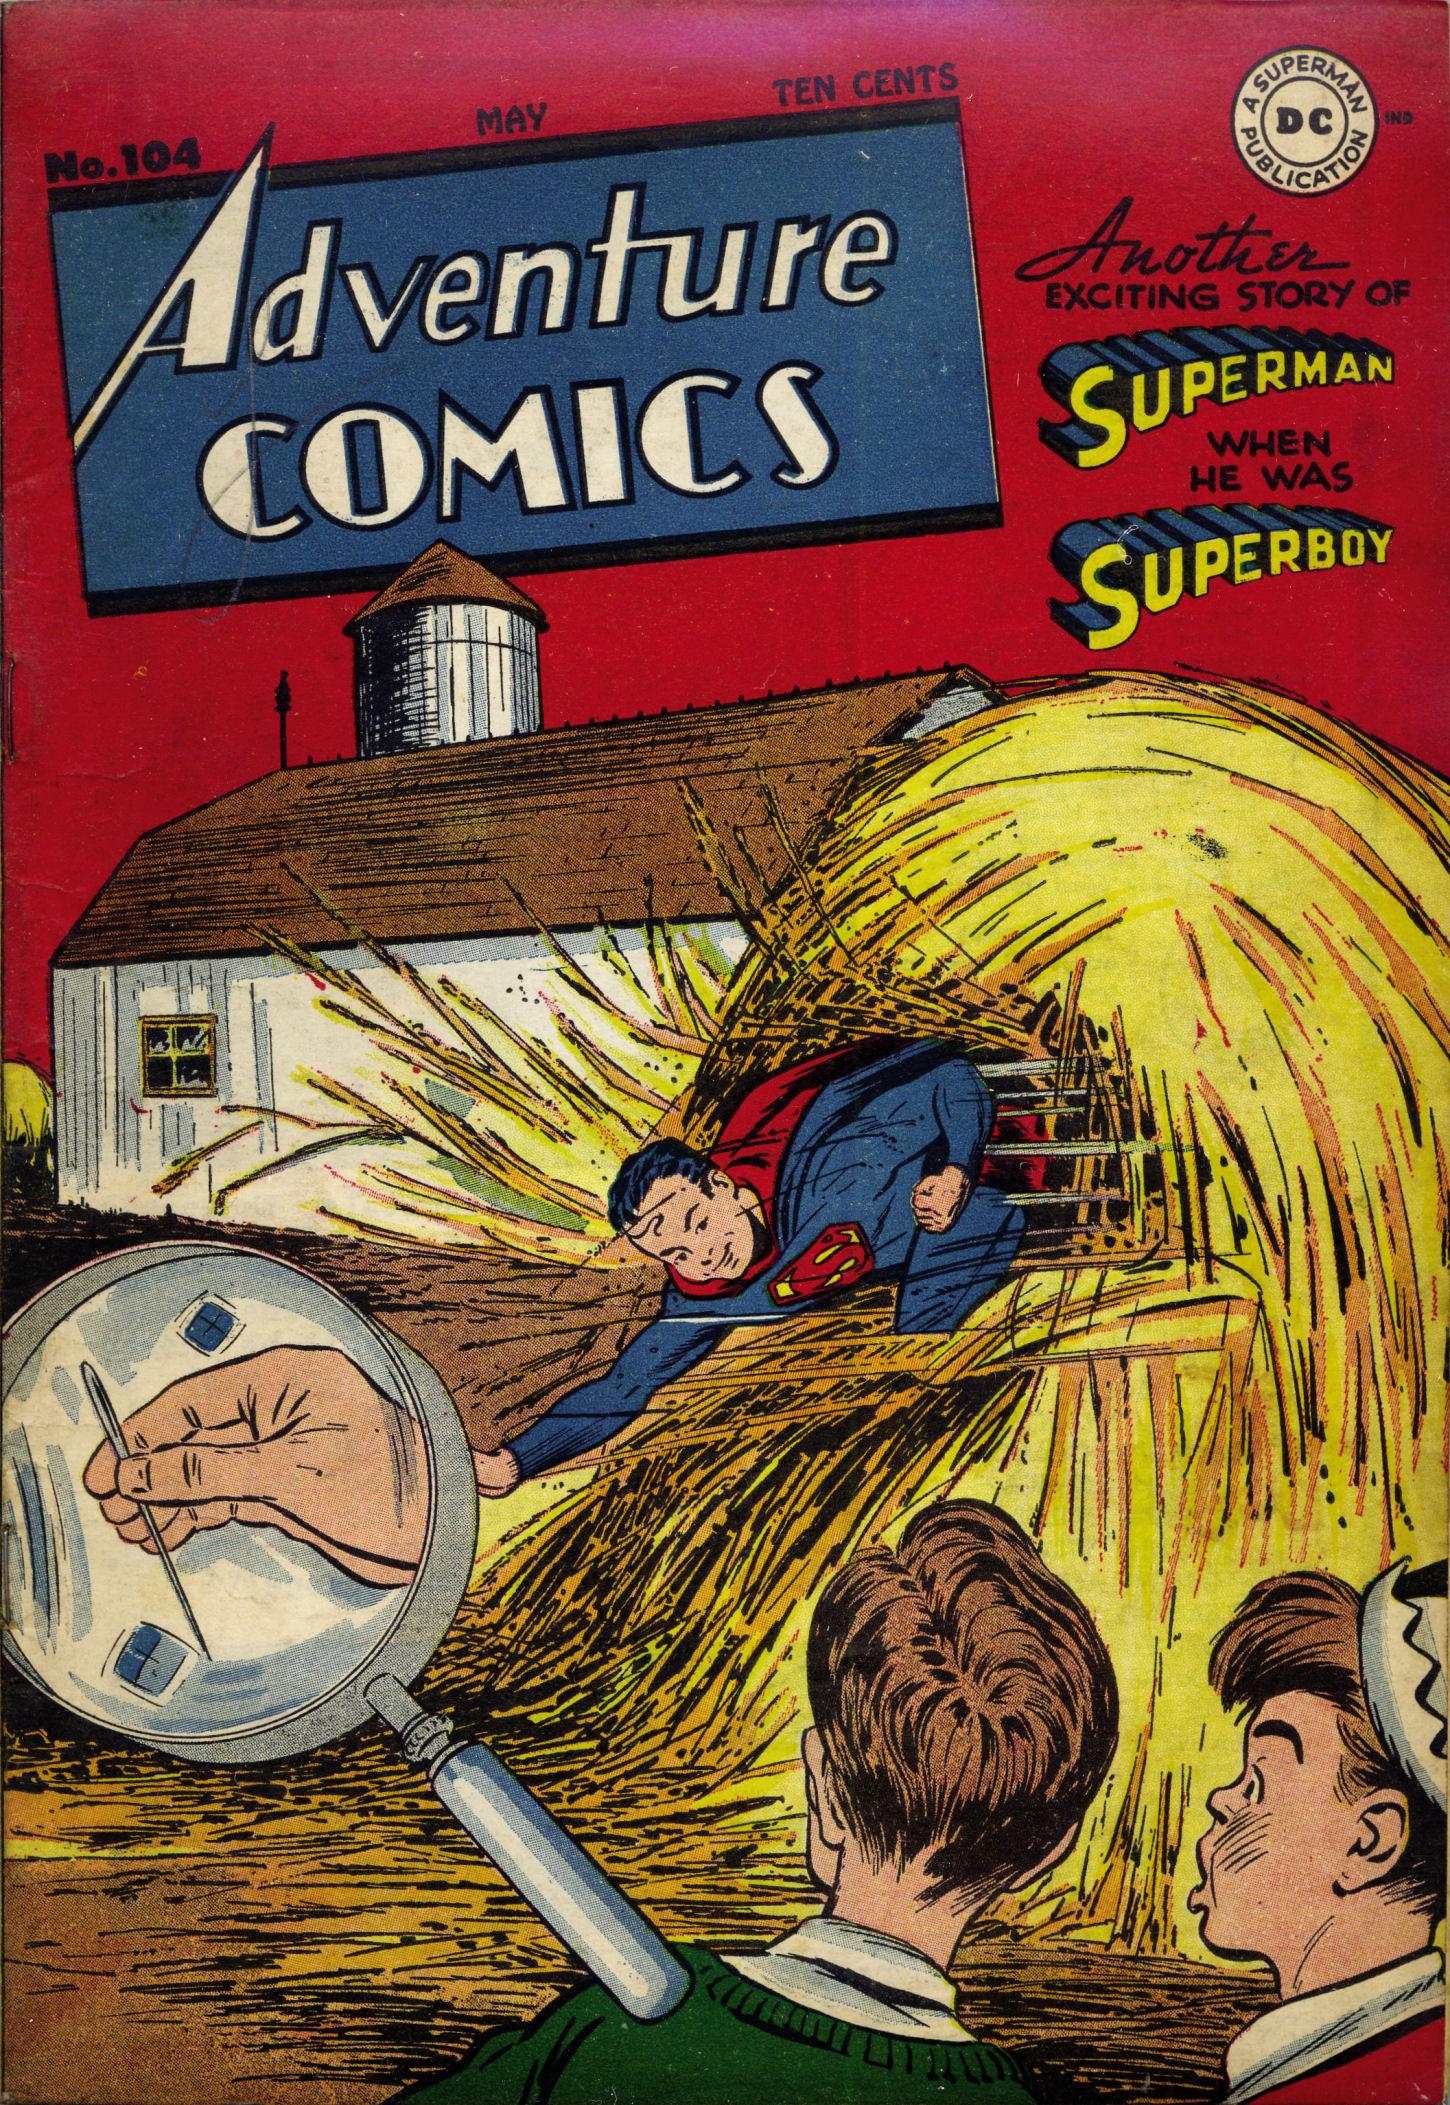 Read online Adventure Comics (1938) comic -  Issue #104 - 2